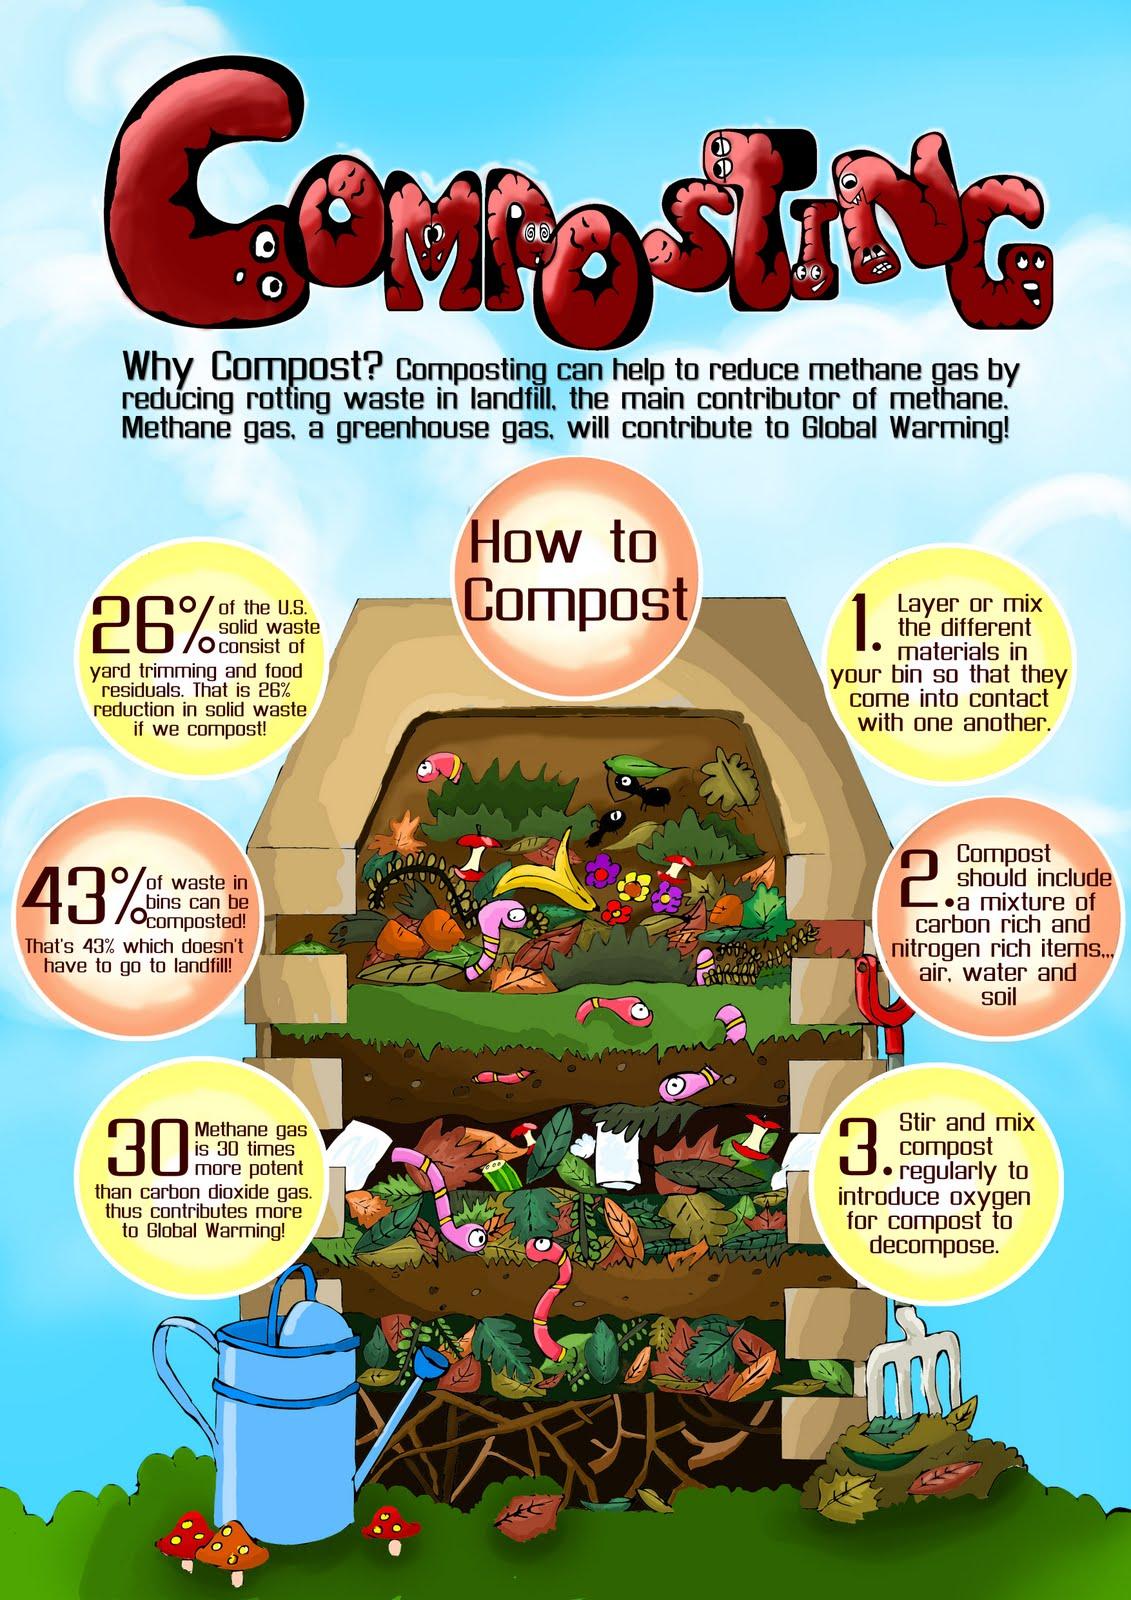 Je me souviens: Assignment 5 - Infographic